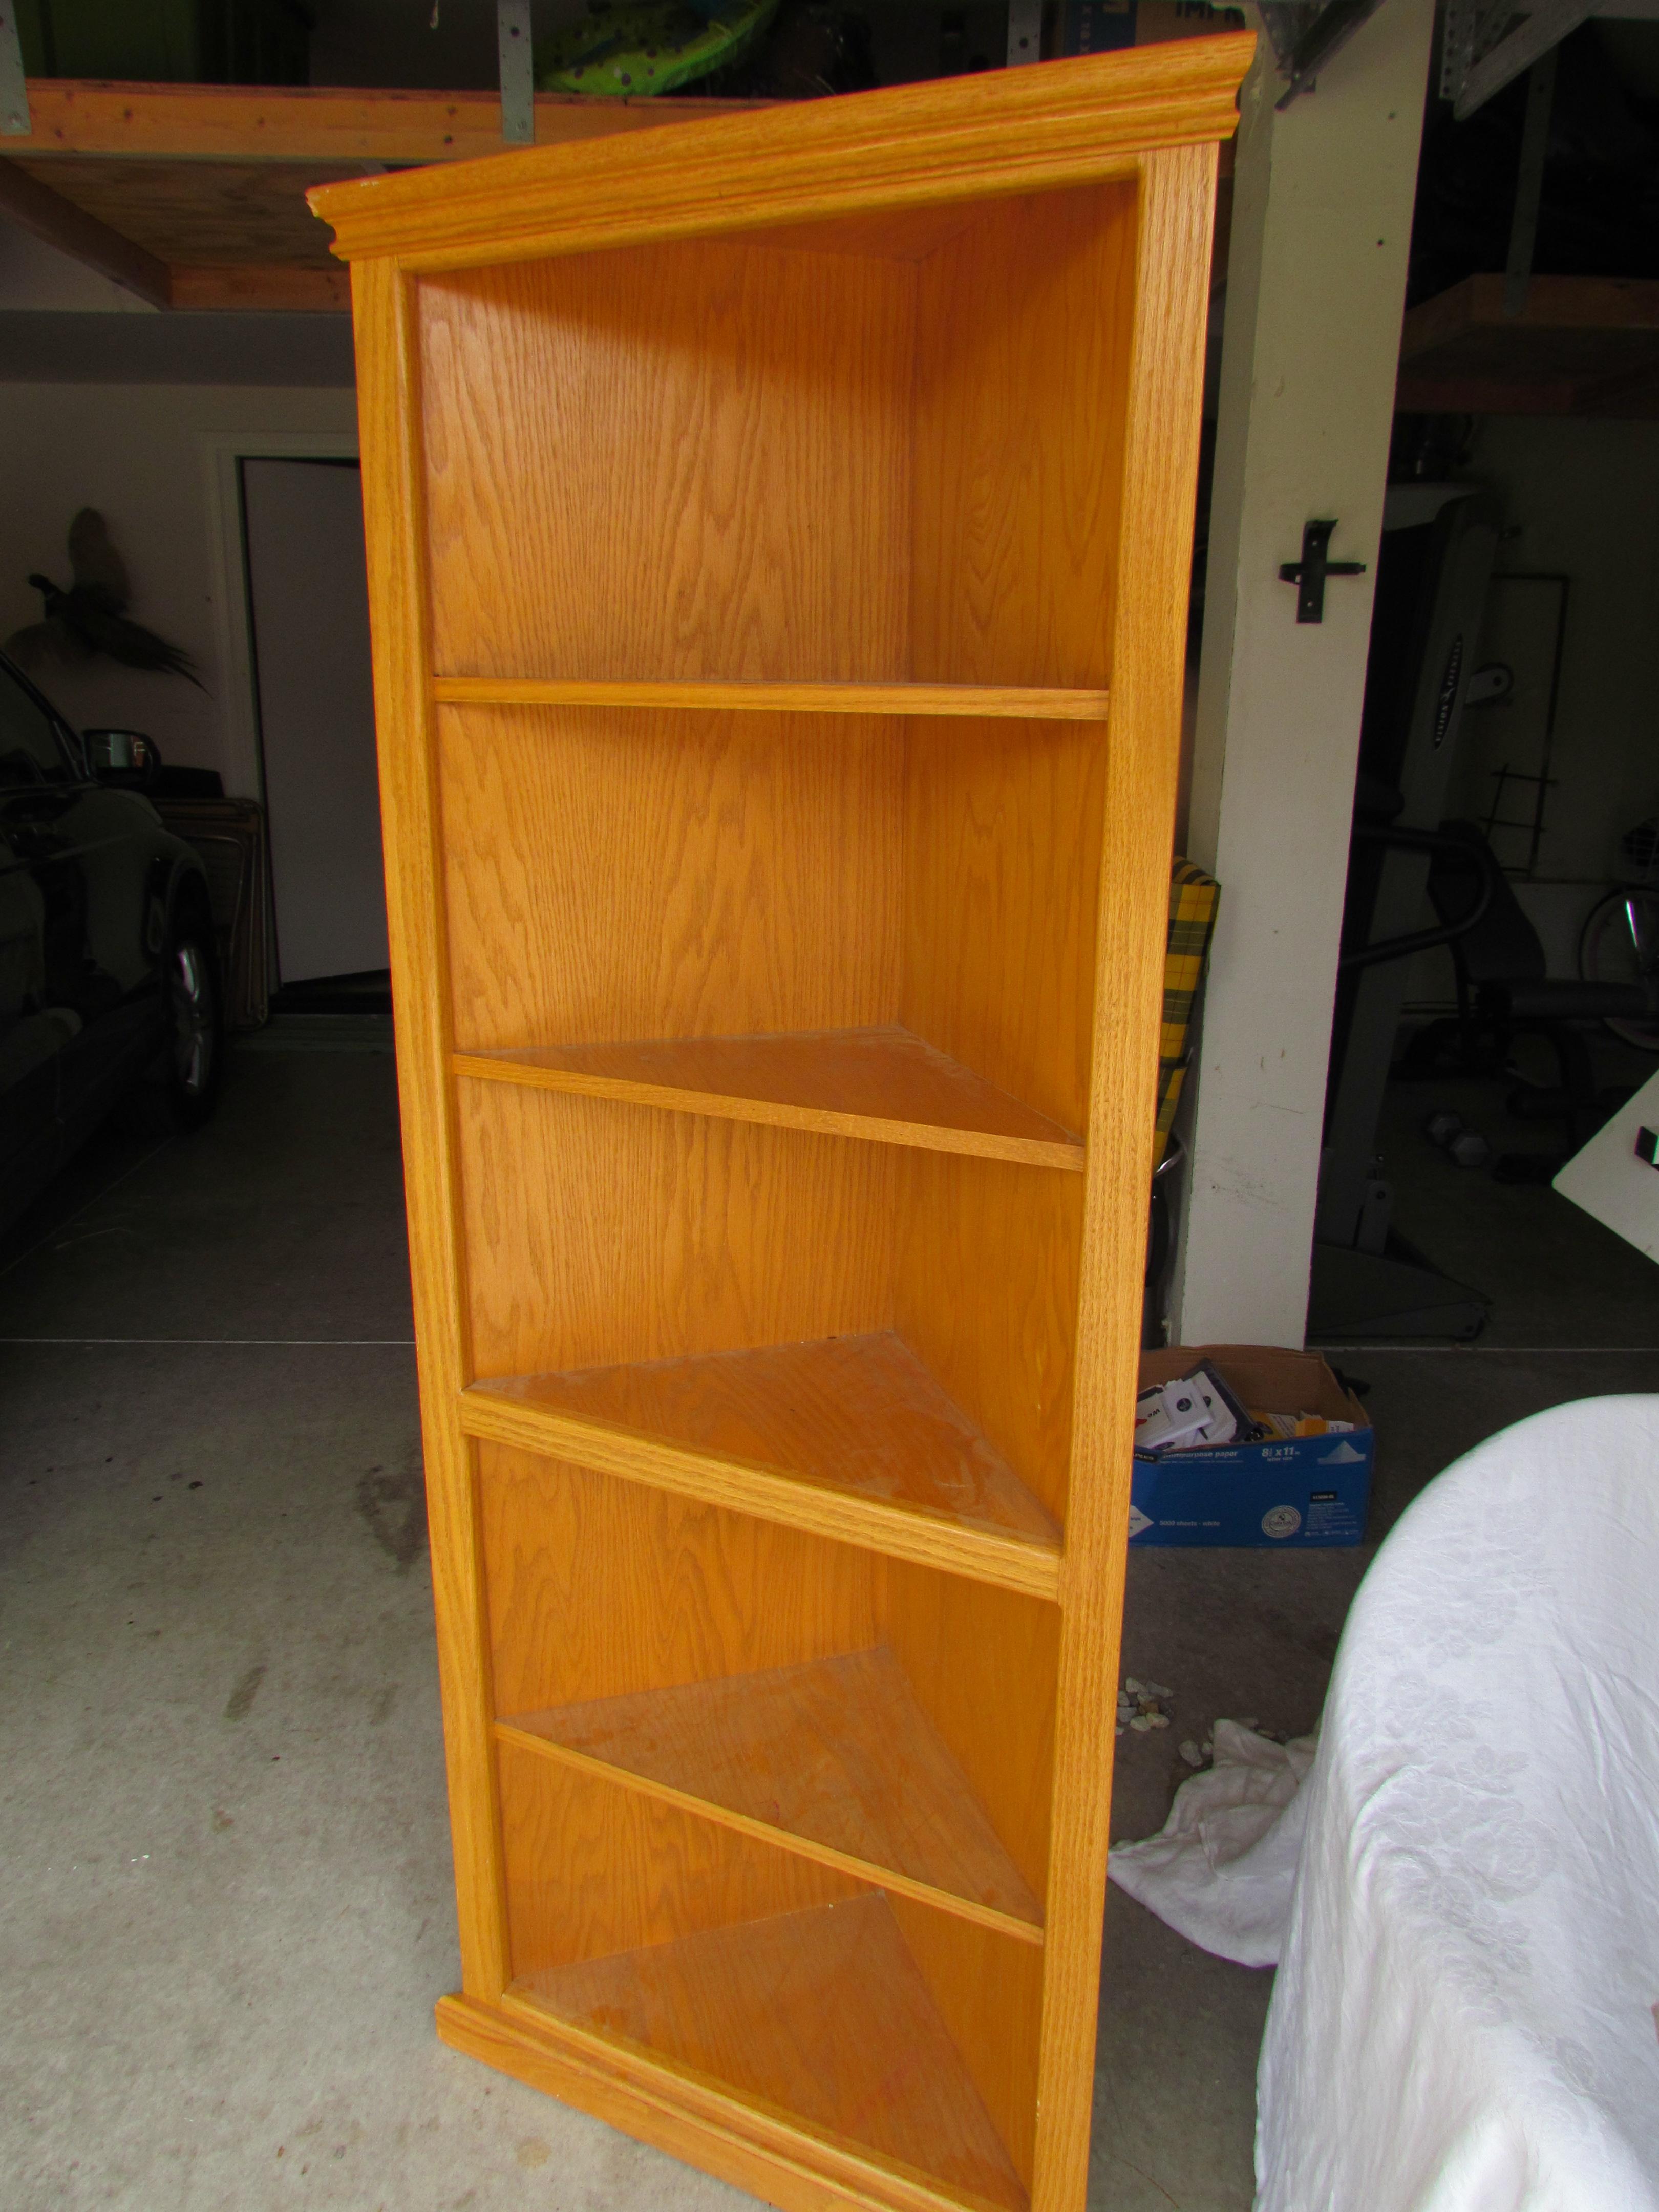 Hokey Oak Bookcase Remake D I Y Midcenturyobsession Regarding Corner Oak Bookcase (View 7 of 15)